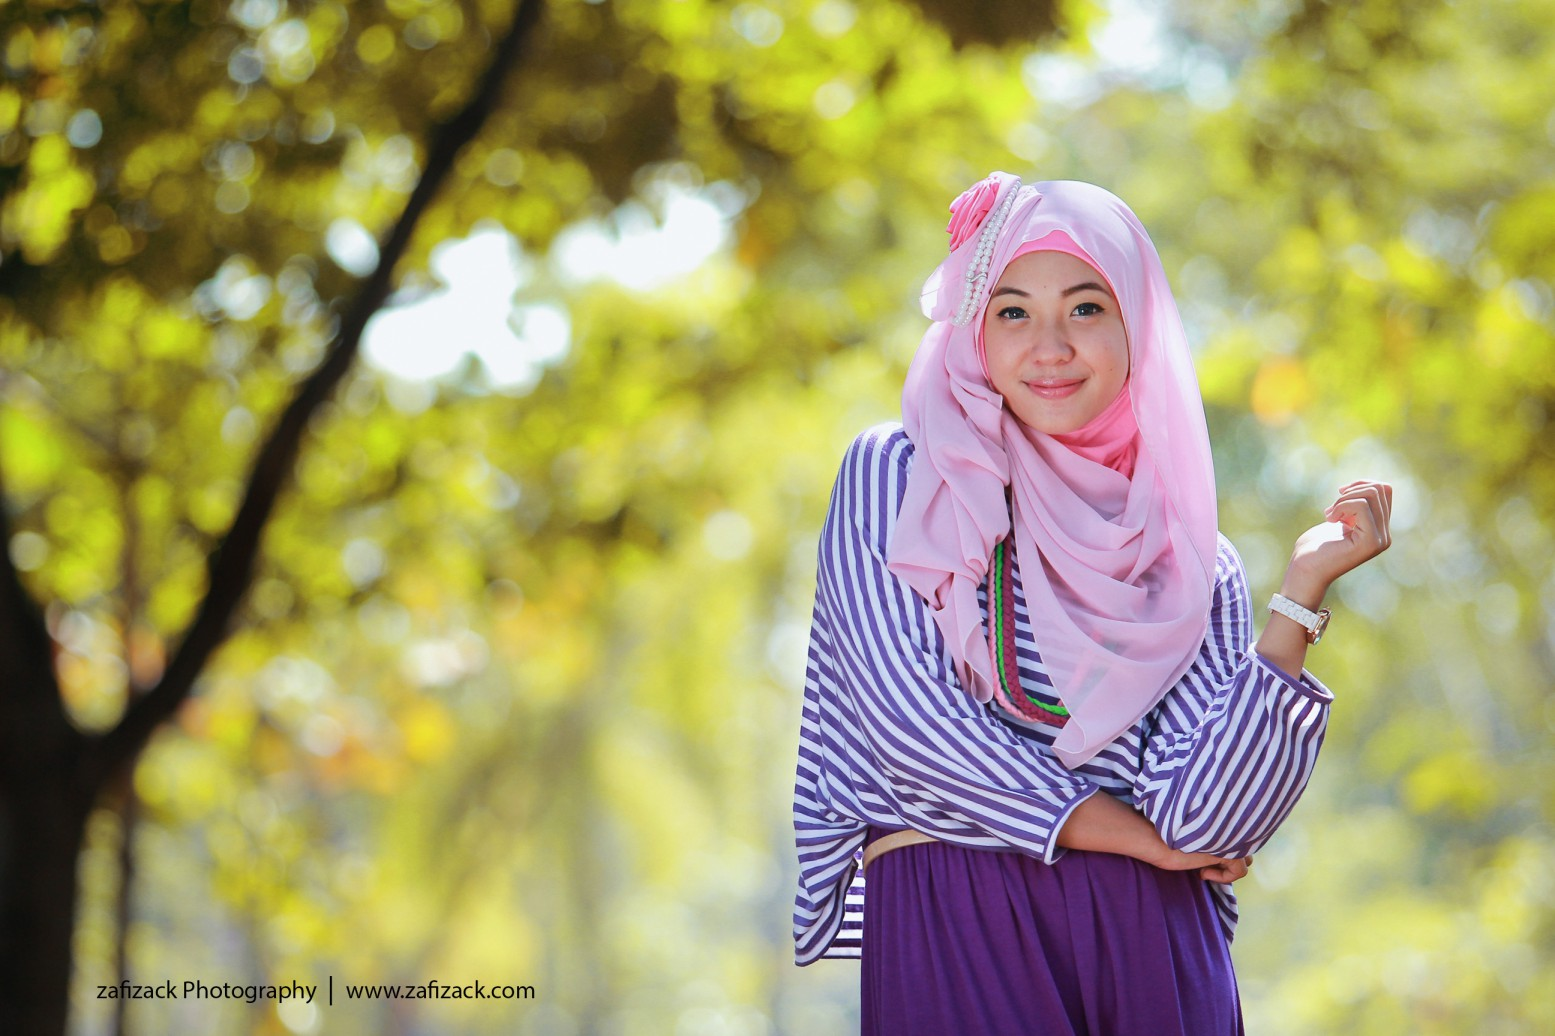 Rosita Permatasari Hijab Style Zafizack Photography